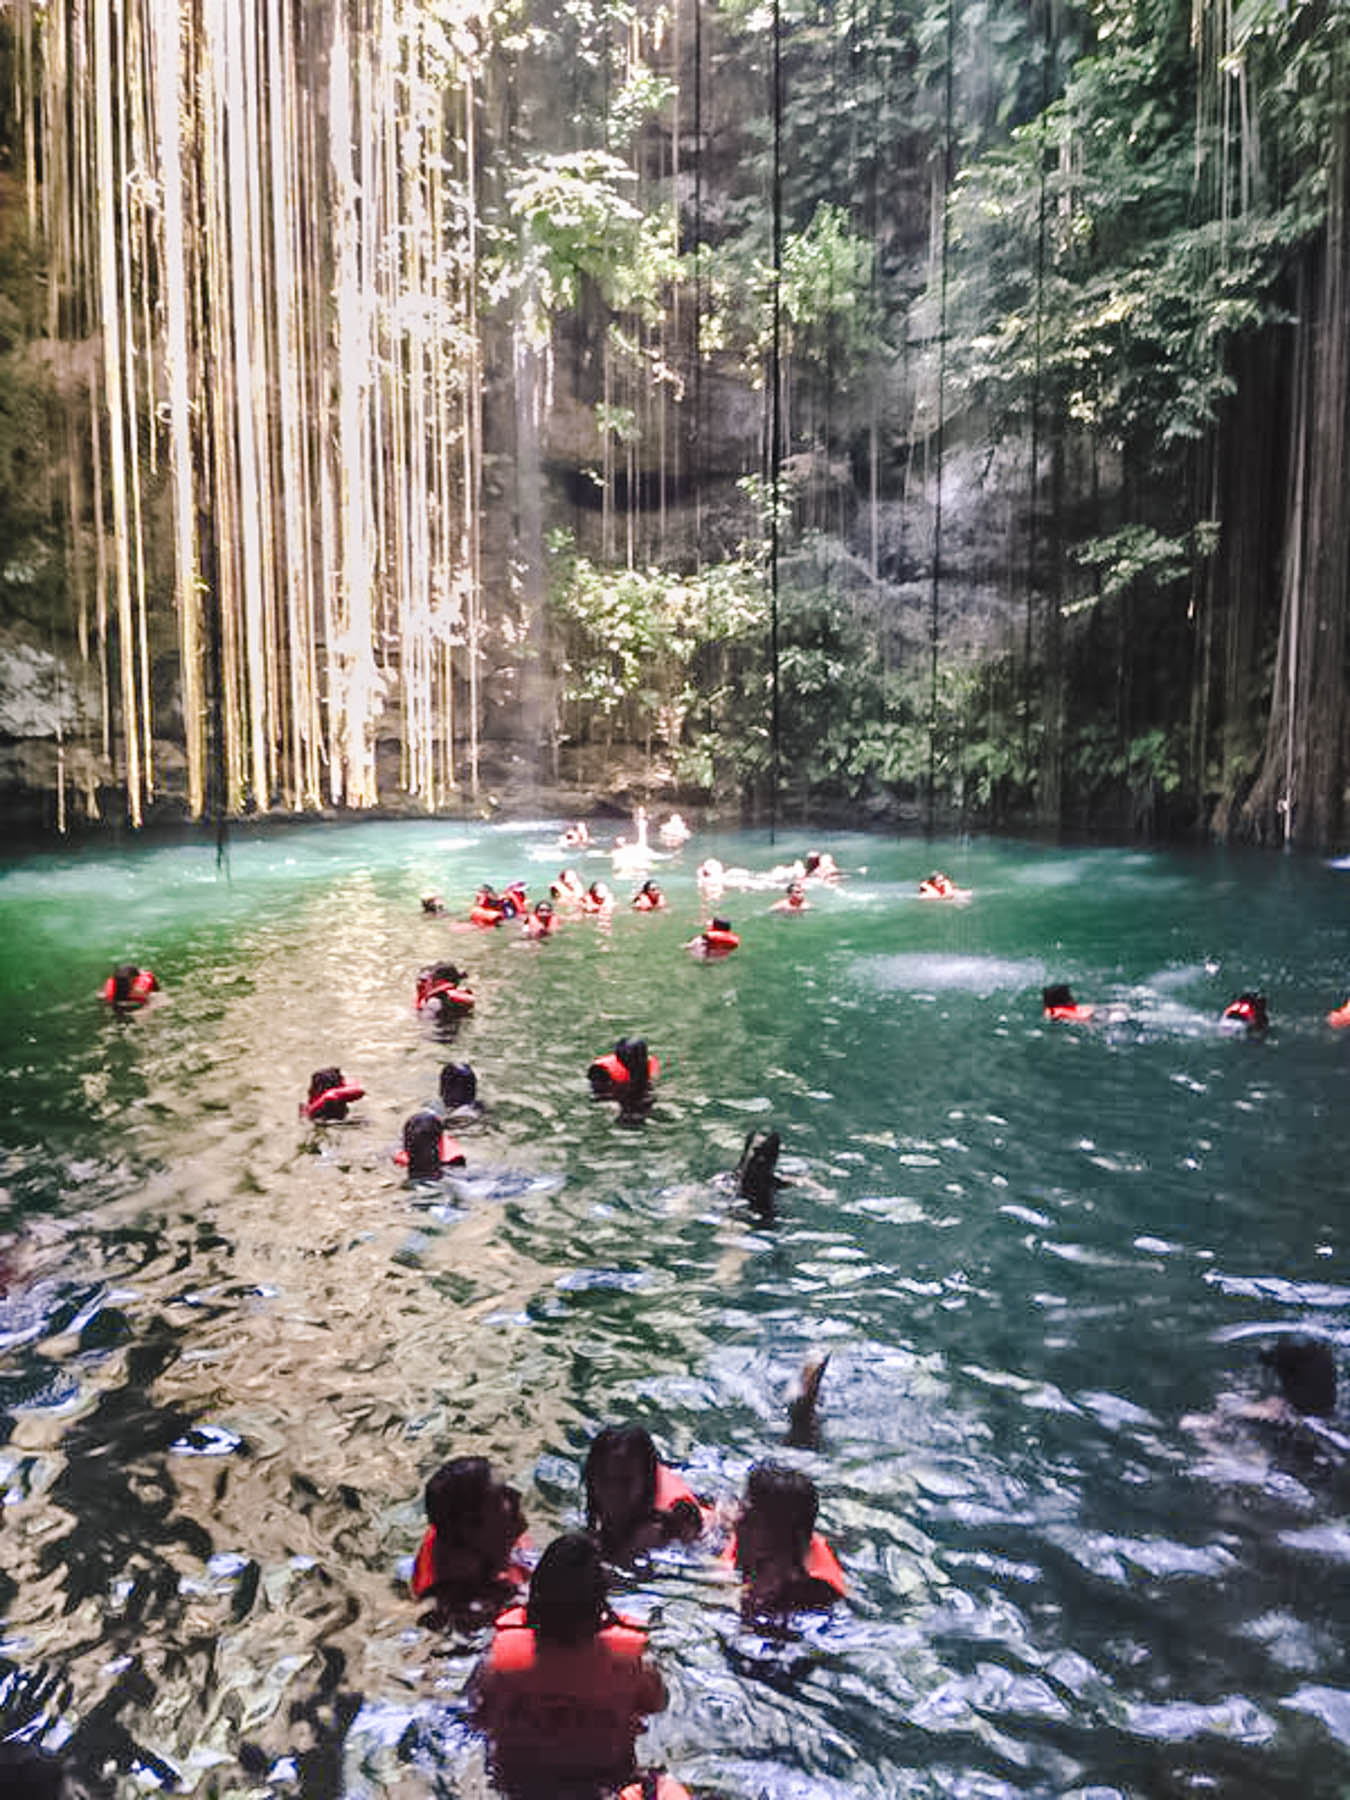 Ik Kil cenote vicino a Chichén Itzá